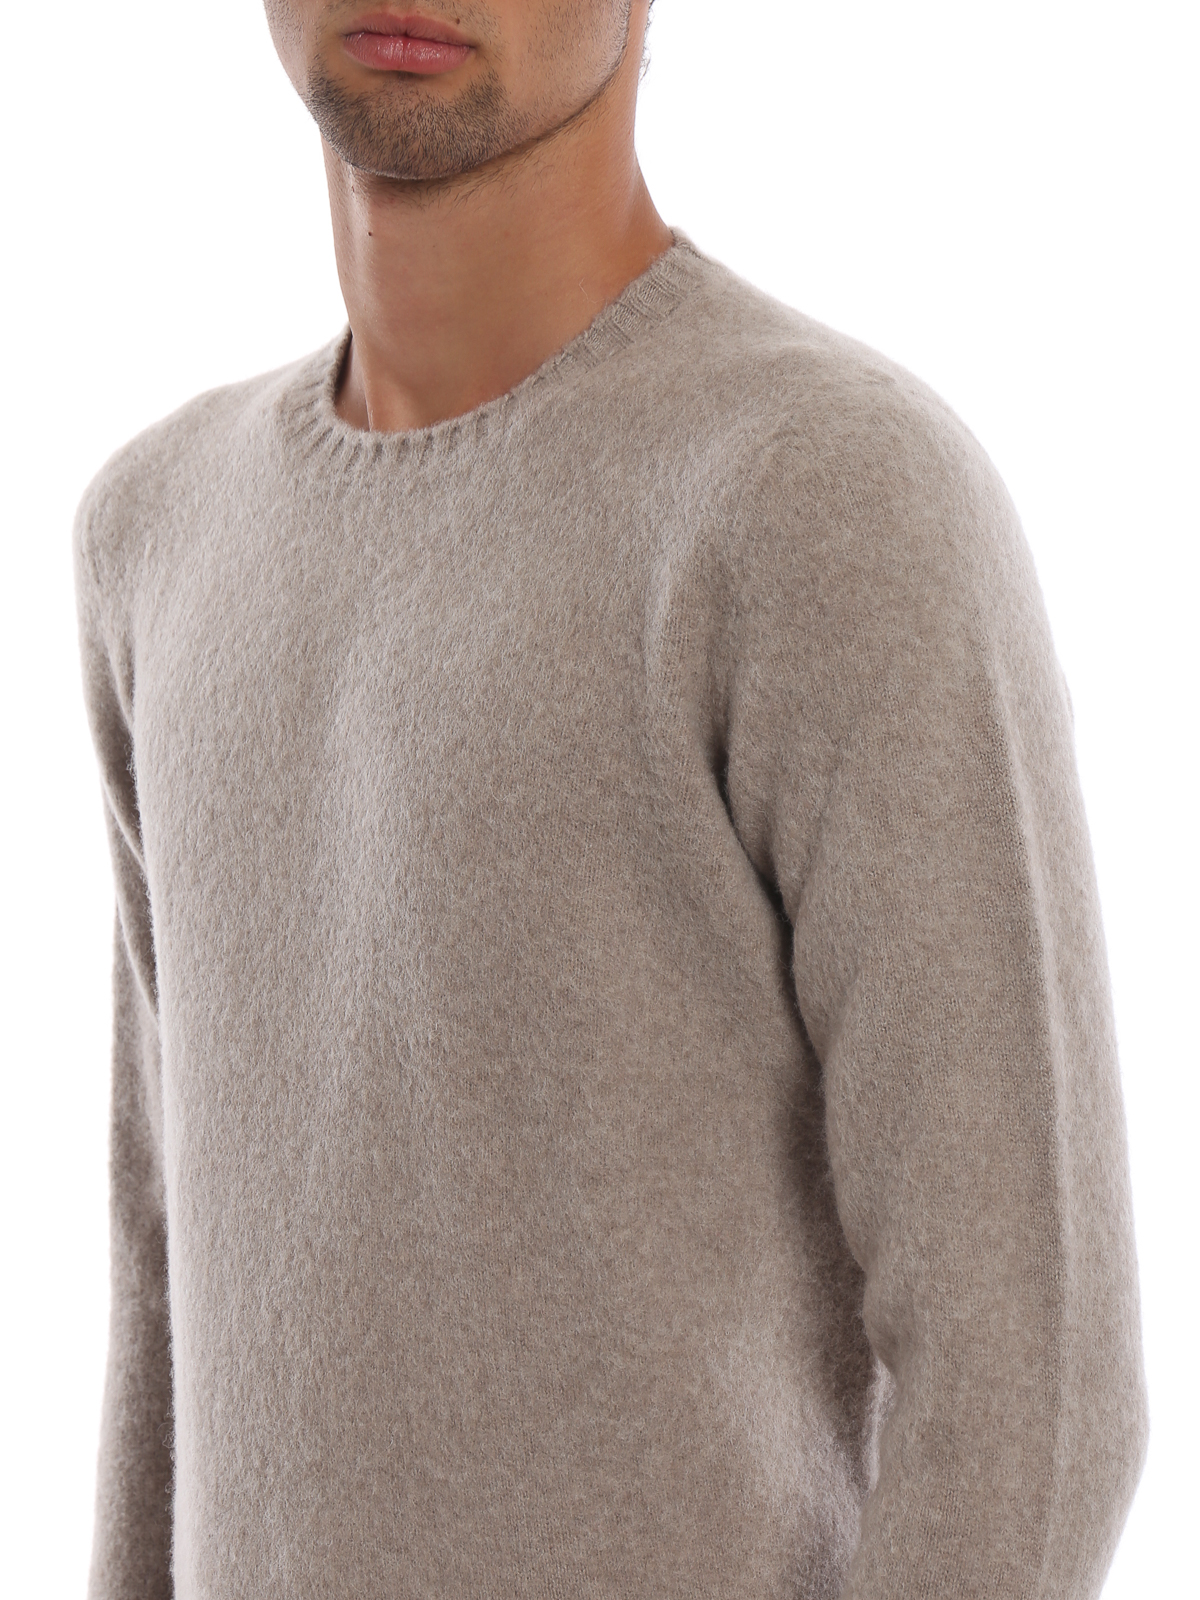 58db1a4cd25114 DRUMOHR buy online Beige brushed lambswool sweater. DRUMOHR: crew necks ...